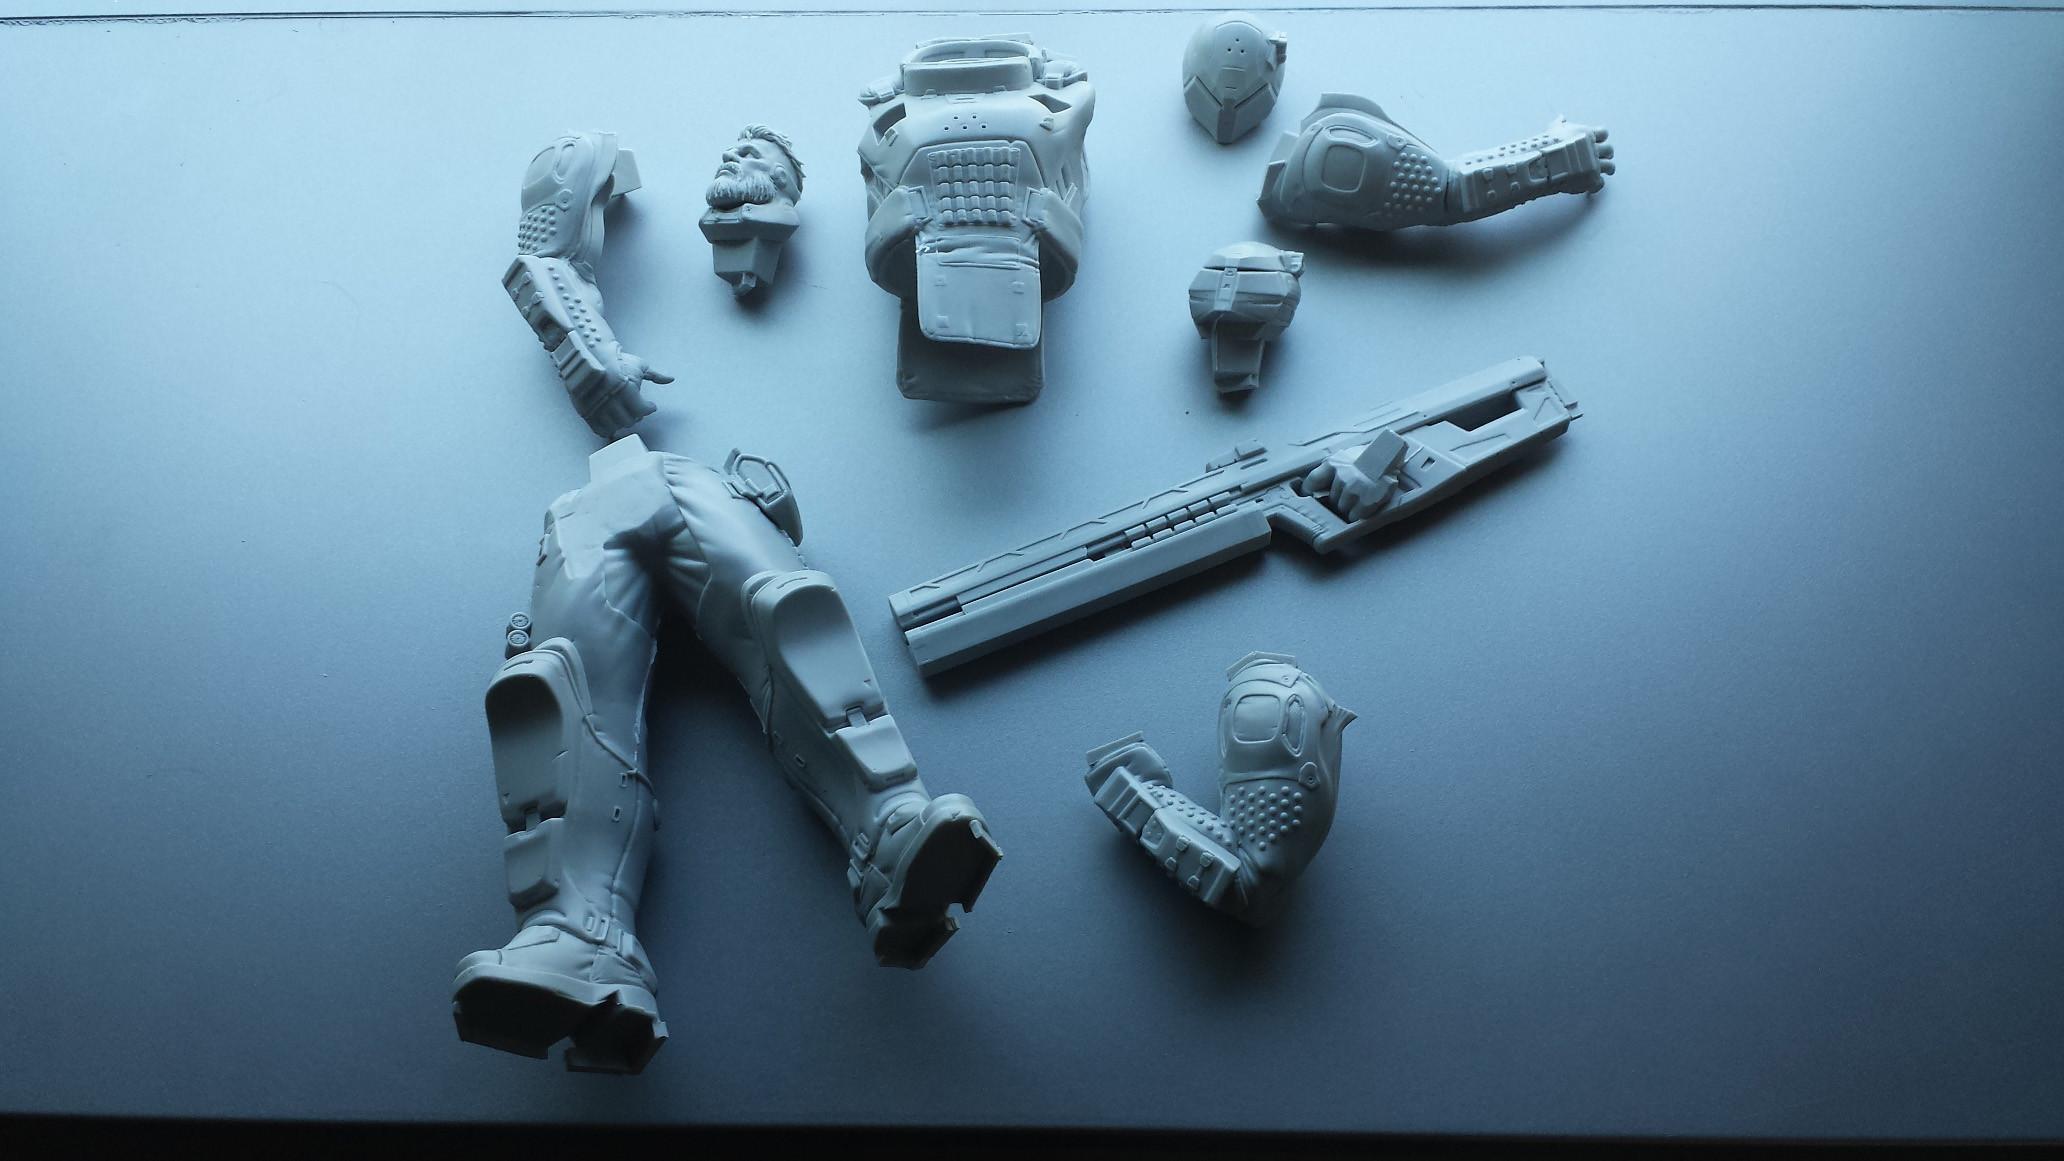 Kit pieces